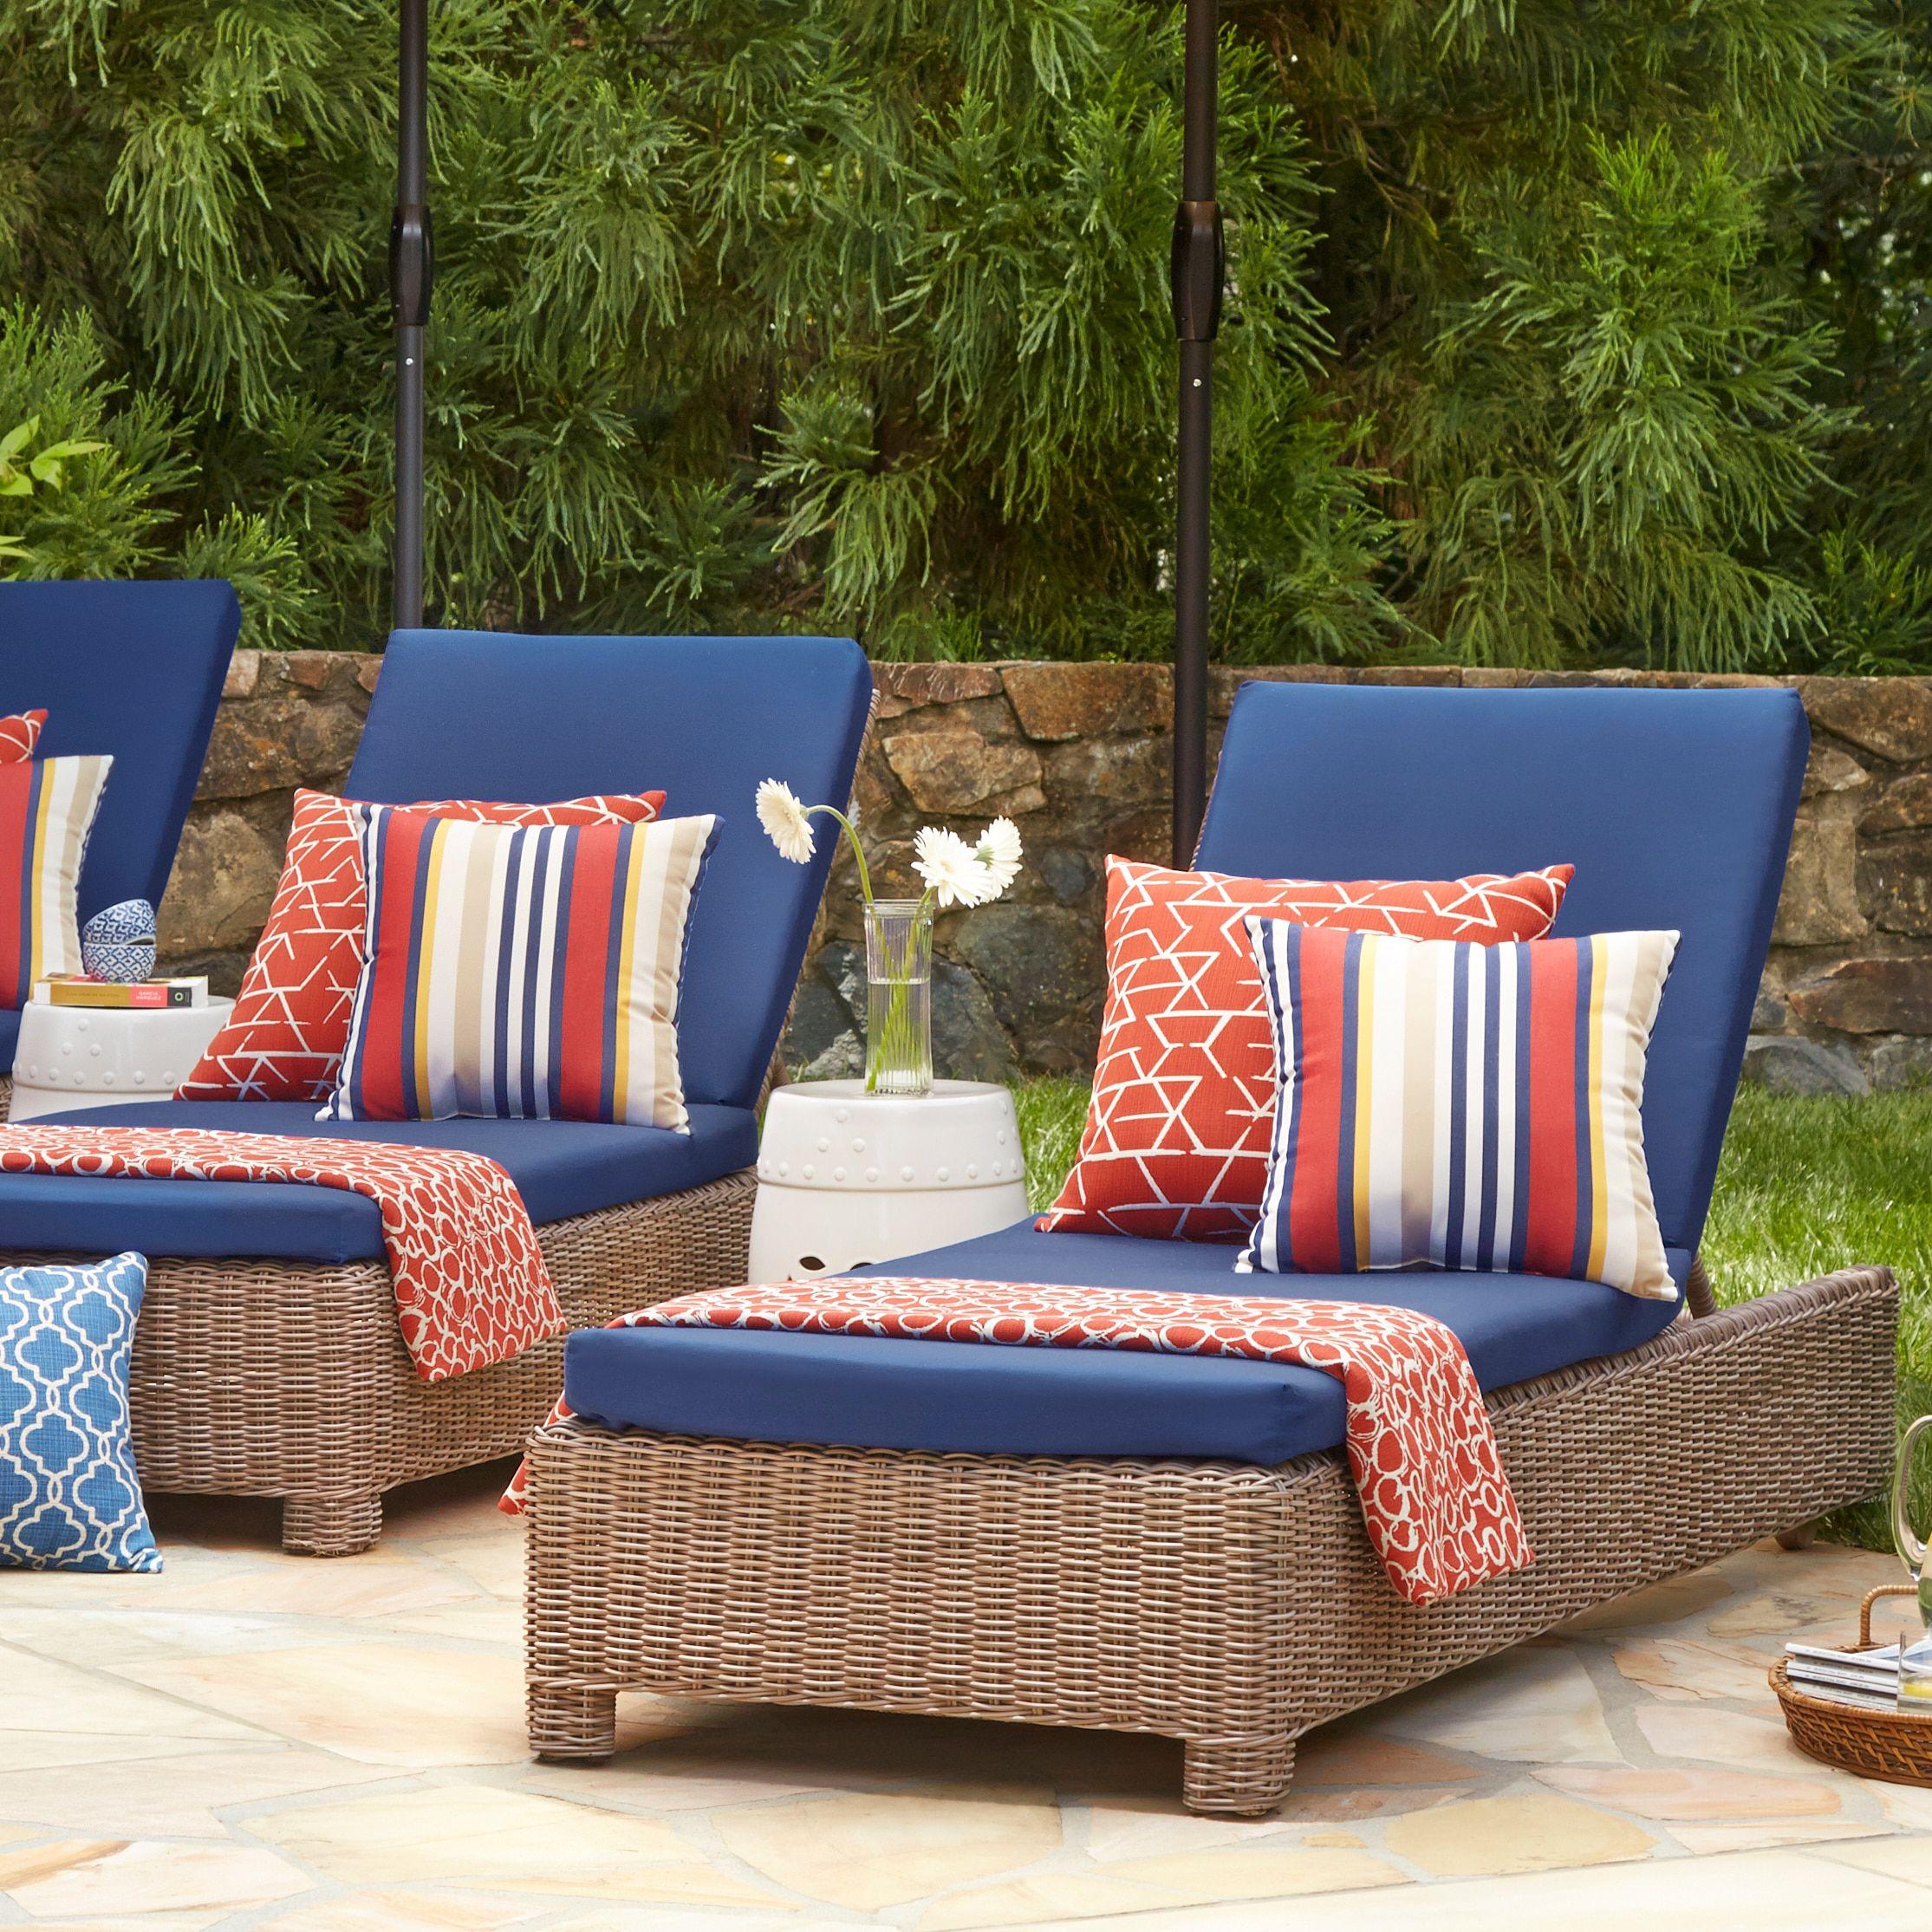 Wood Feature Wallideas: Outdoor Furniture Sets, Outdoor Decor